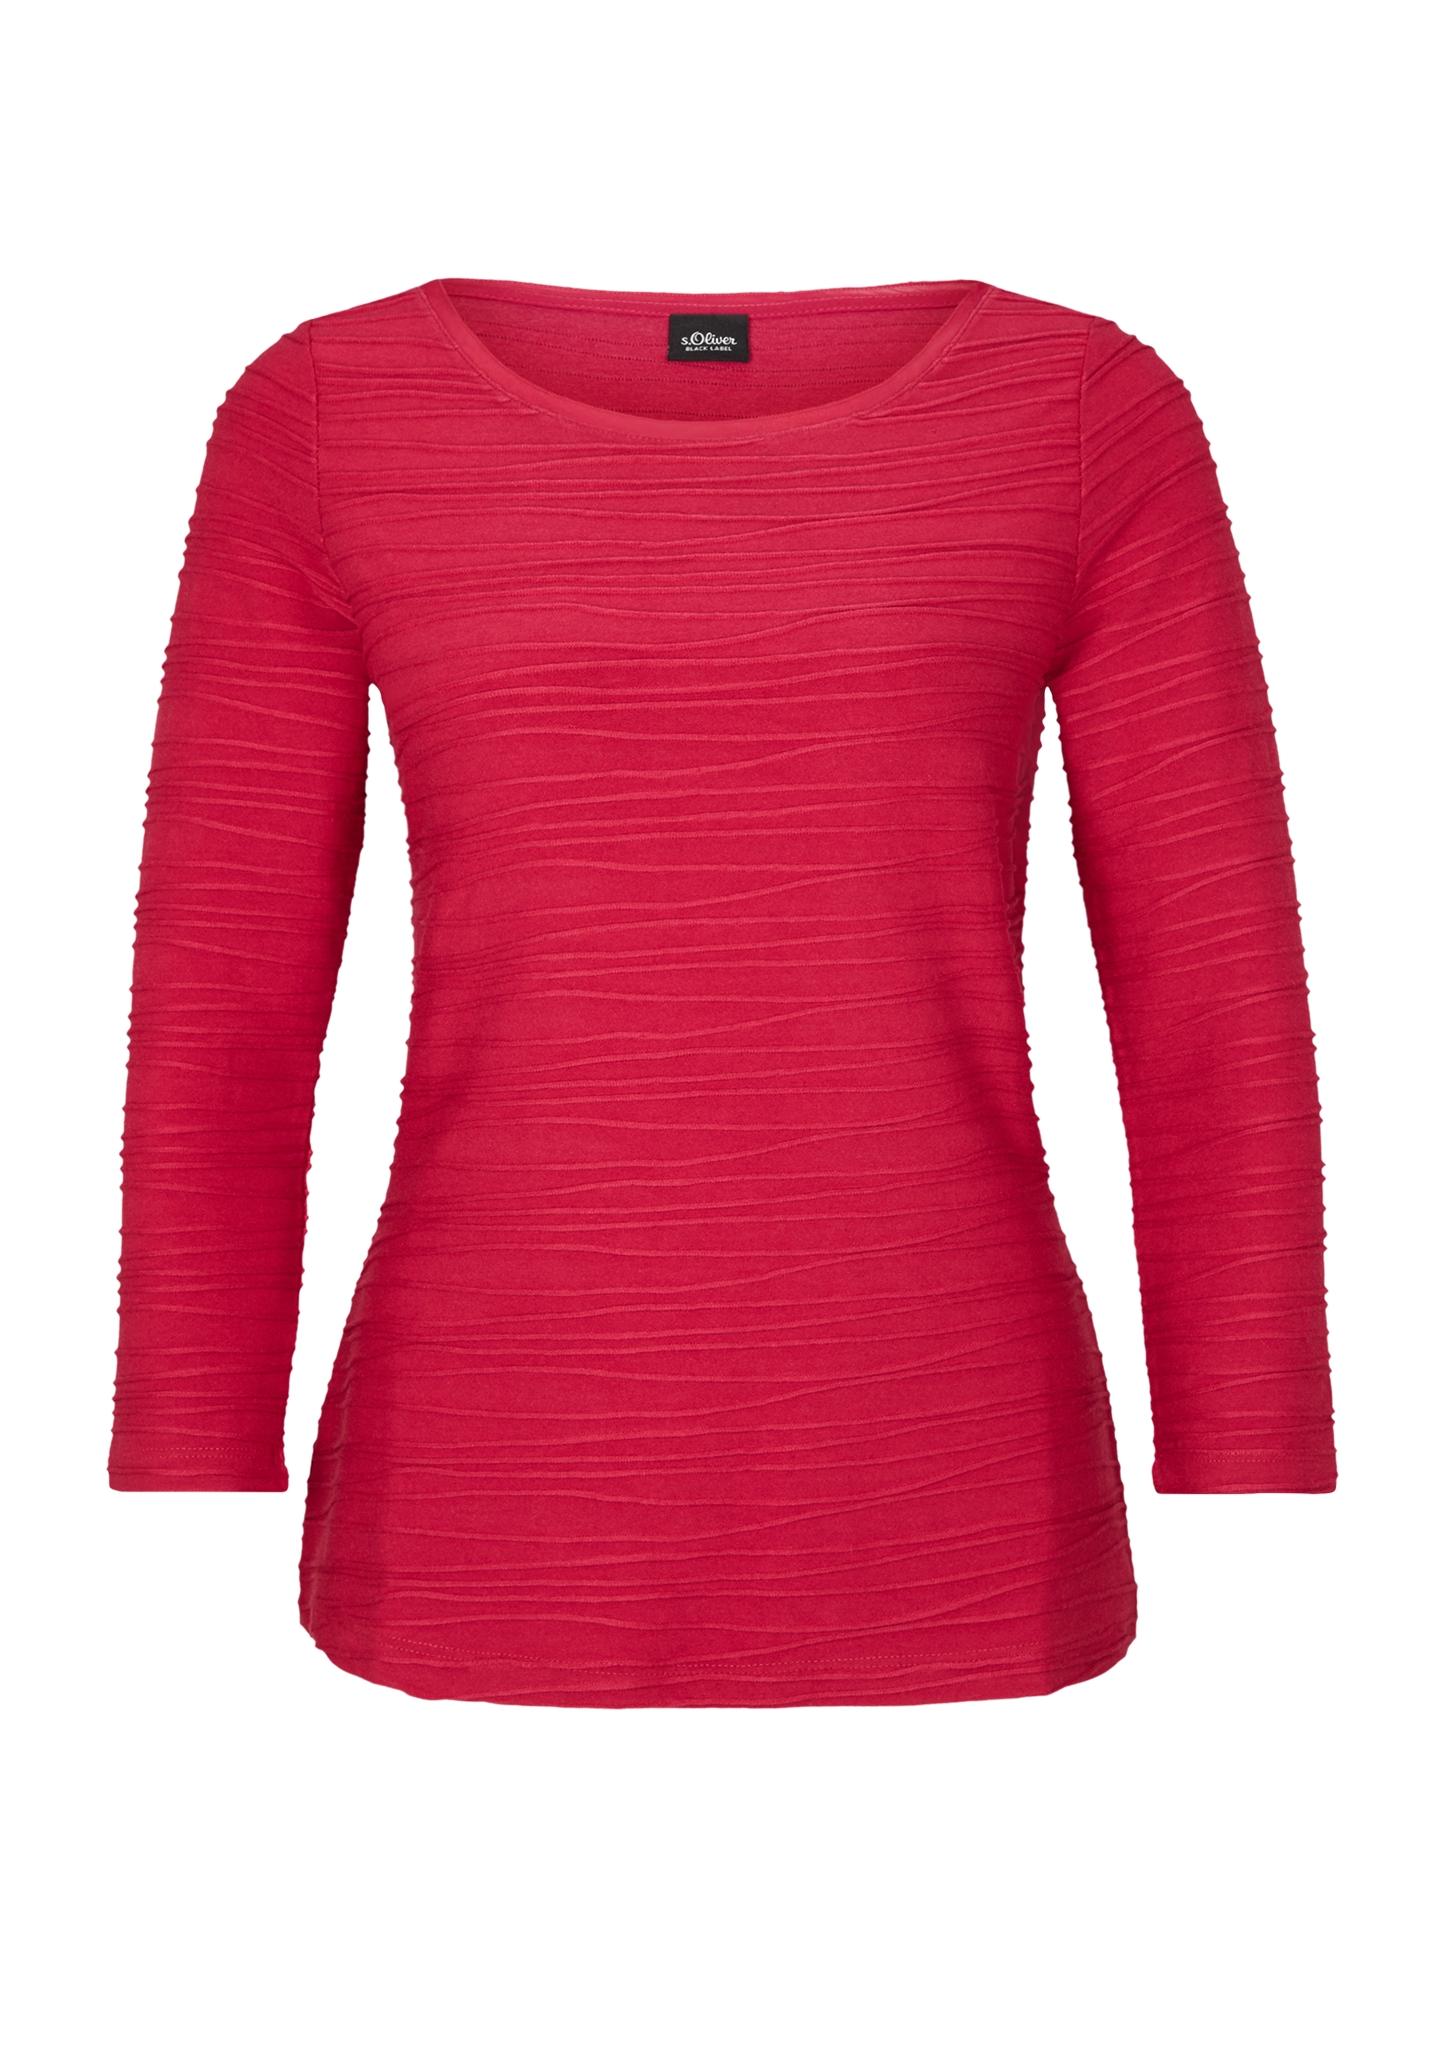 Image of T-Shirt mit 7/8-Arm